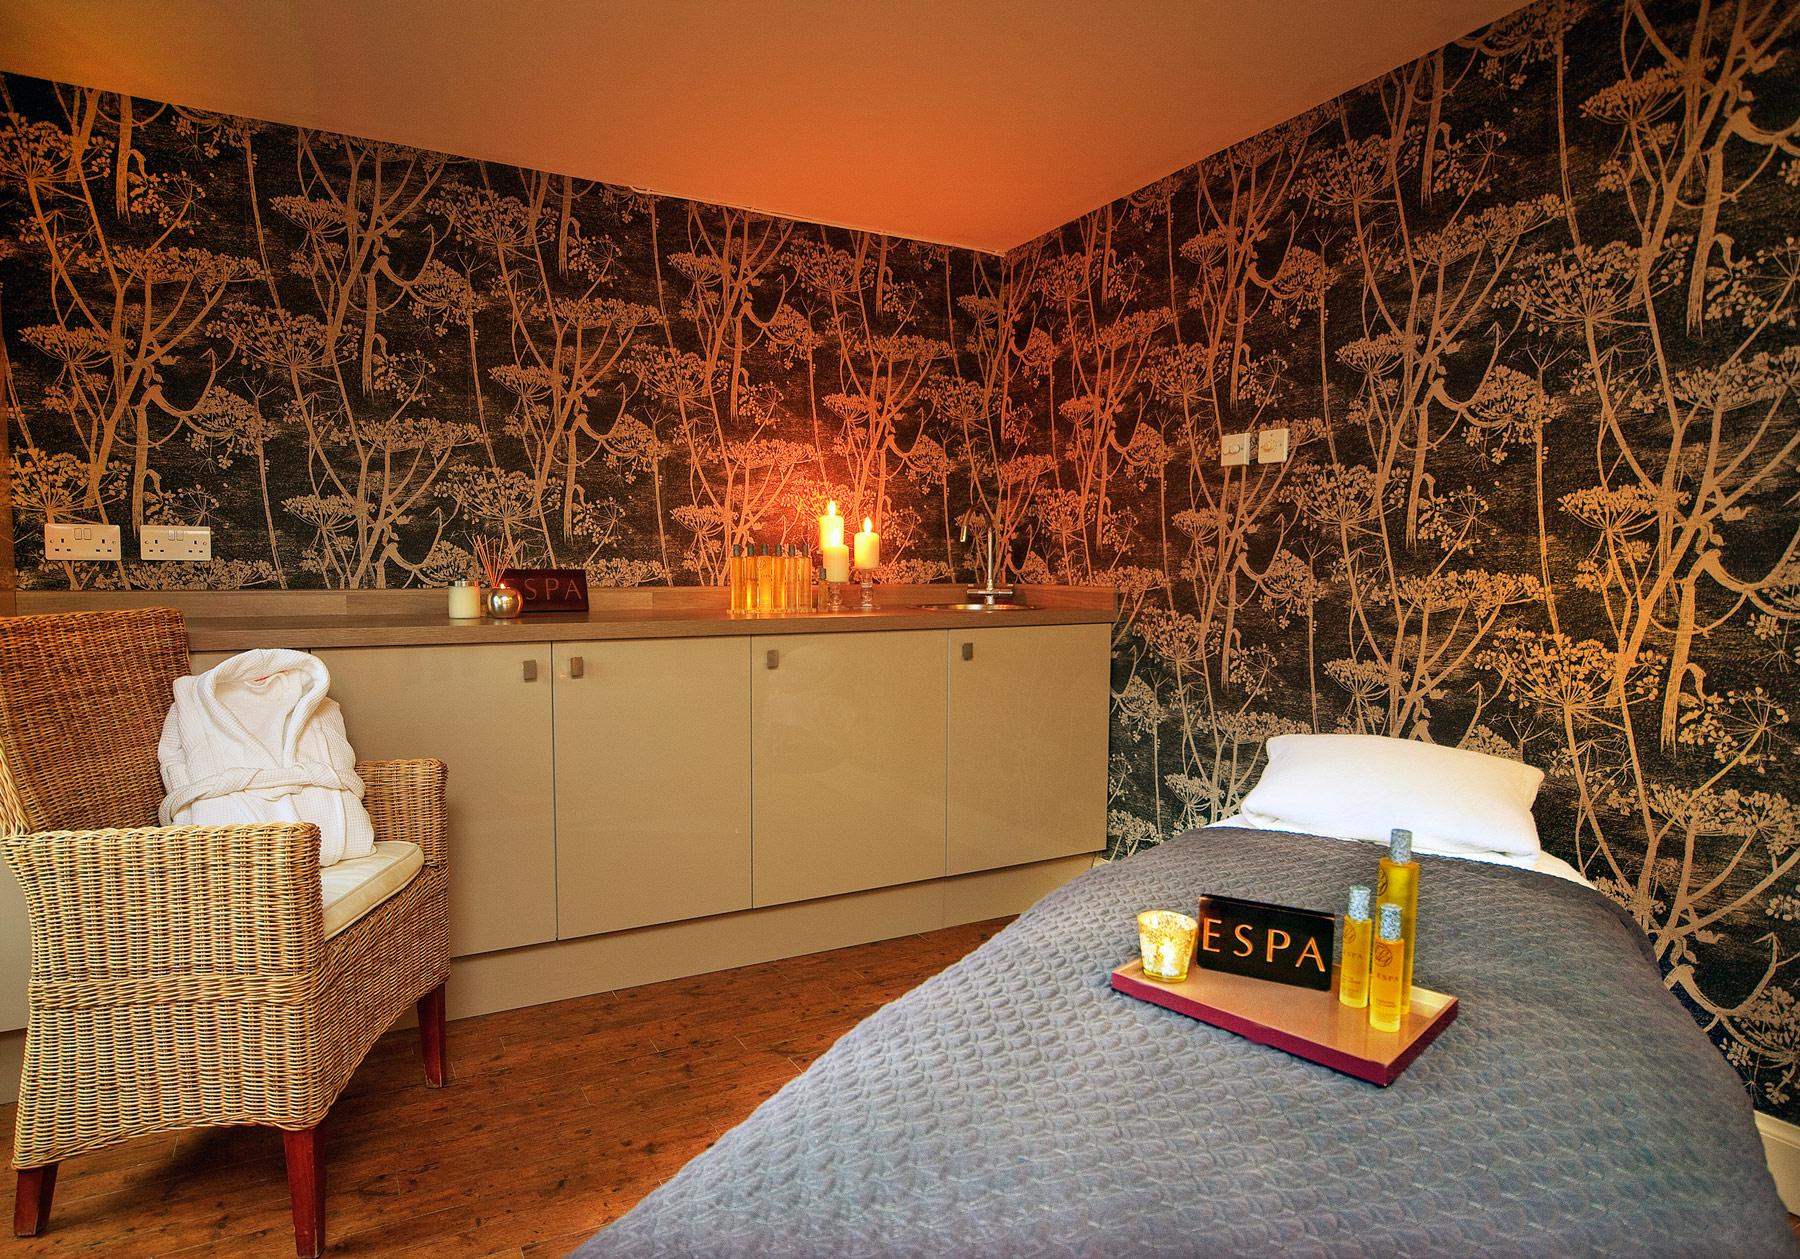 The-Isle-of-Eriska-Hotel-spa